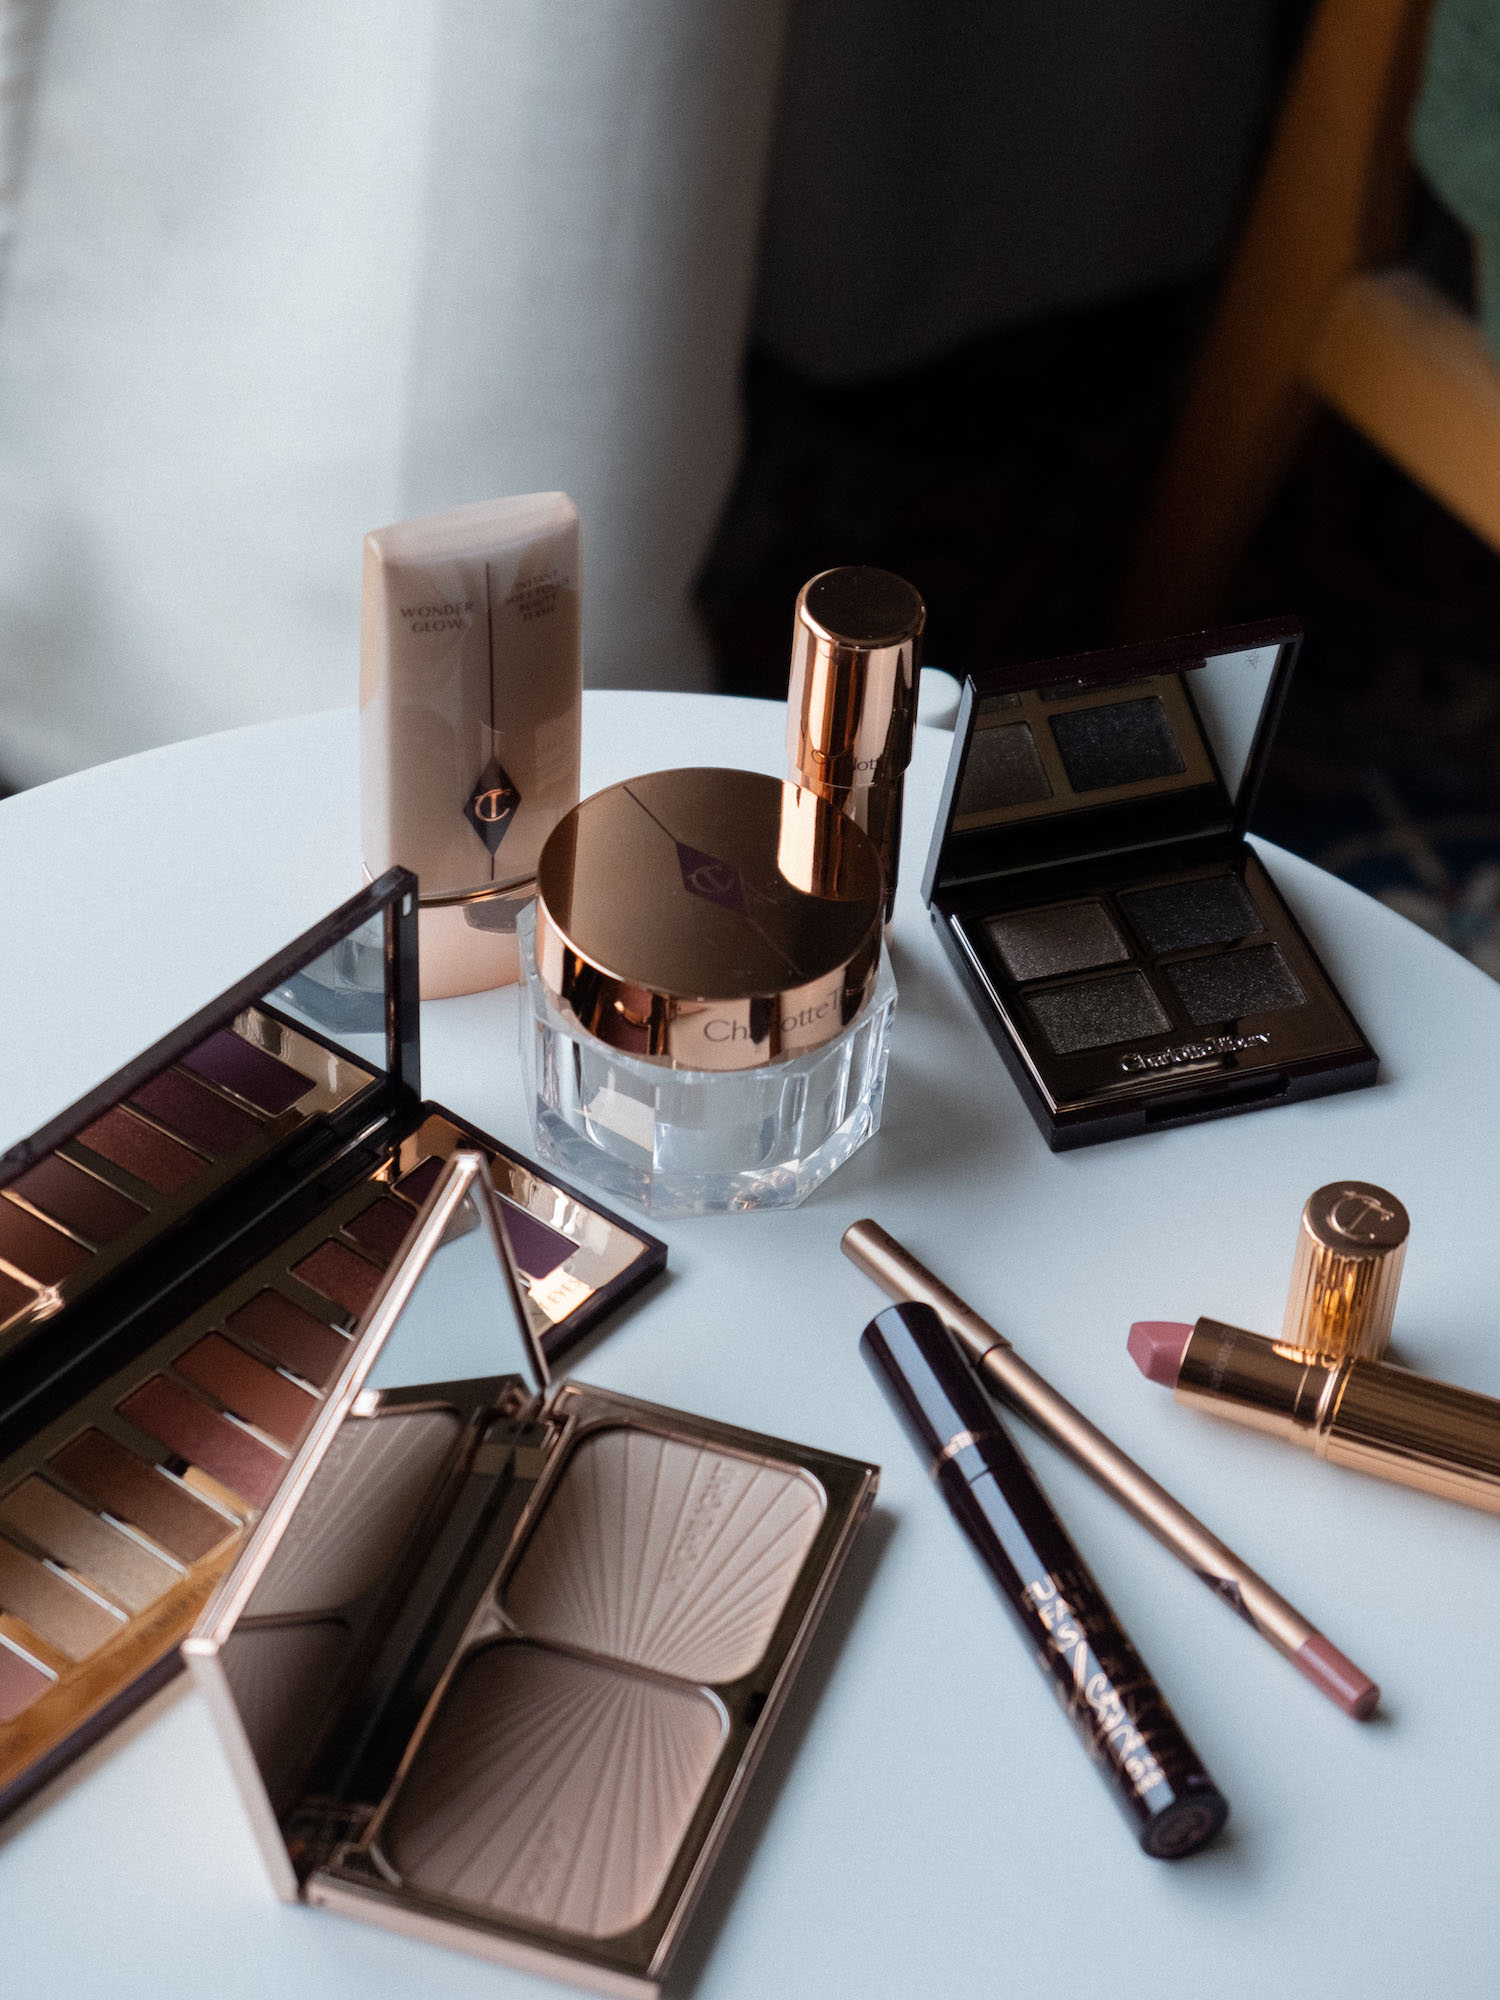 Bare Minds Beauty Adventskalender Charlotte Tilbury Luxury Palette of Pops